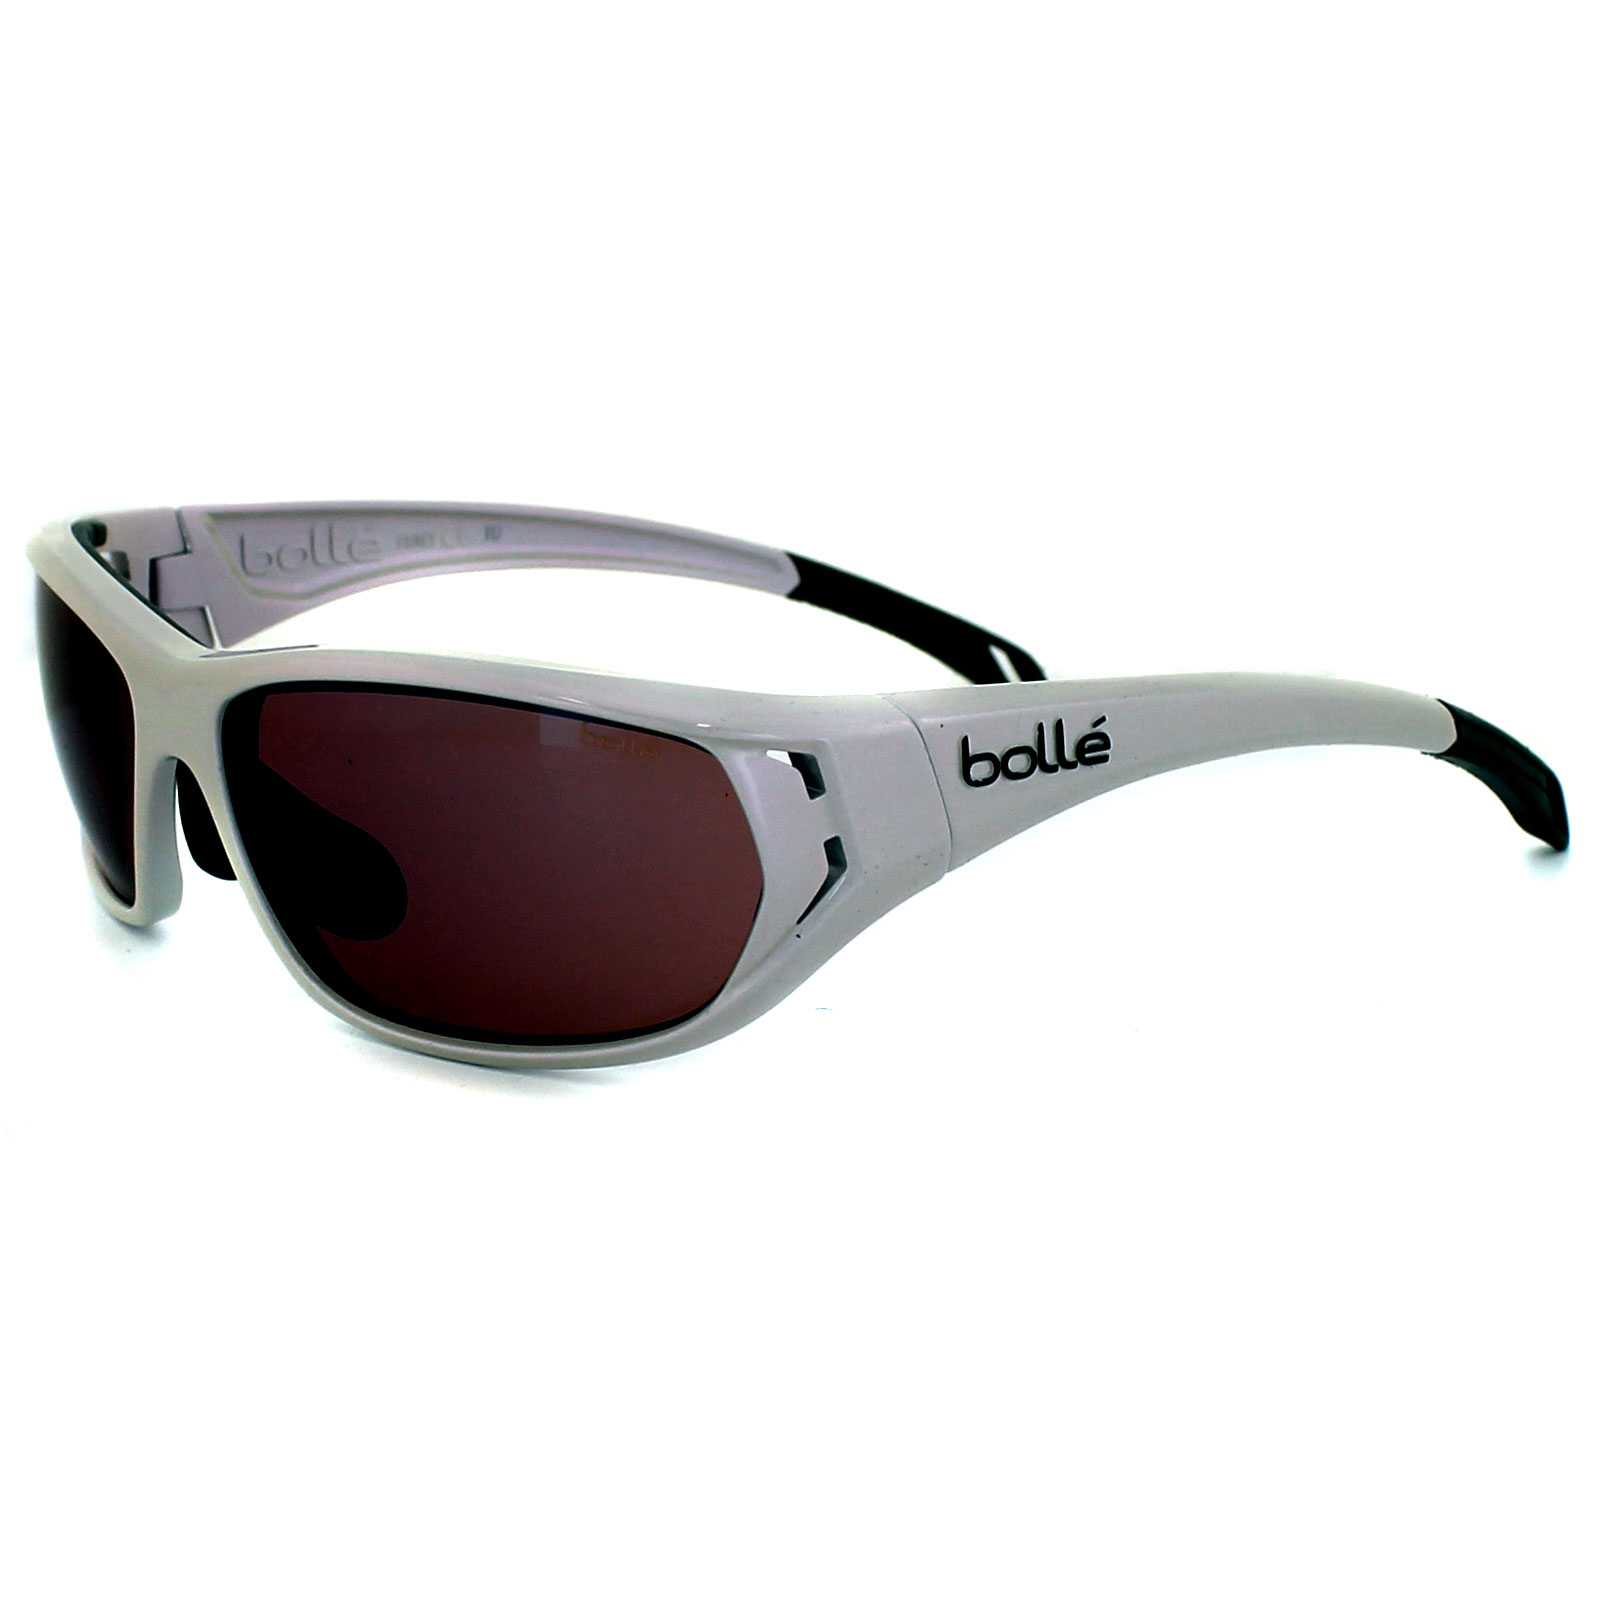 3328ba9297 Discount Bolle Sunglasses